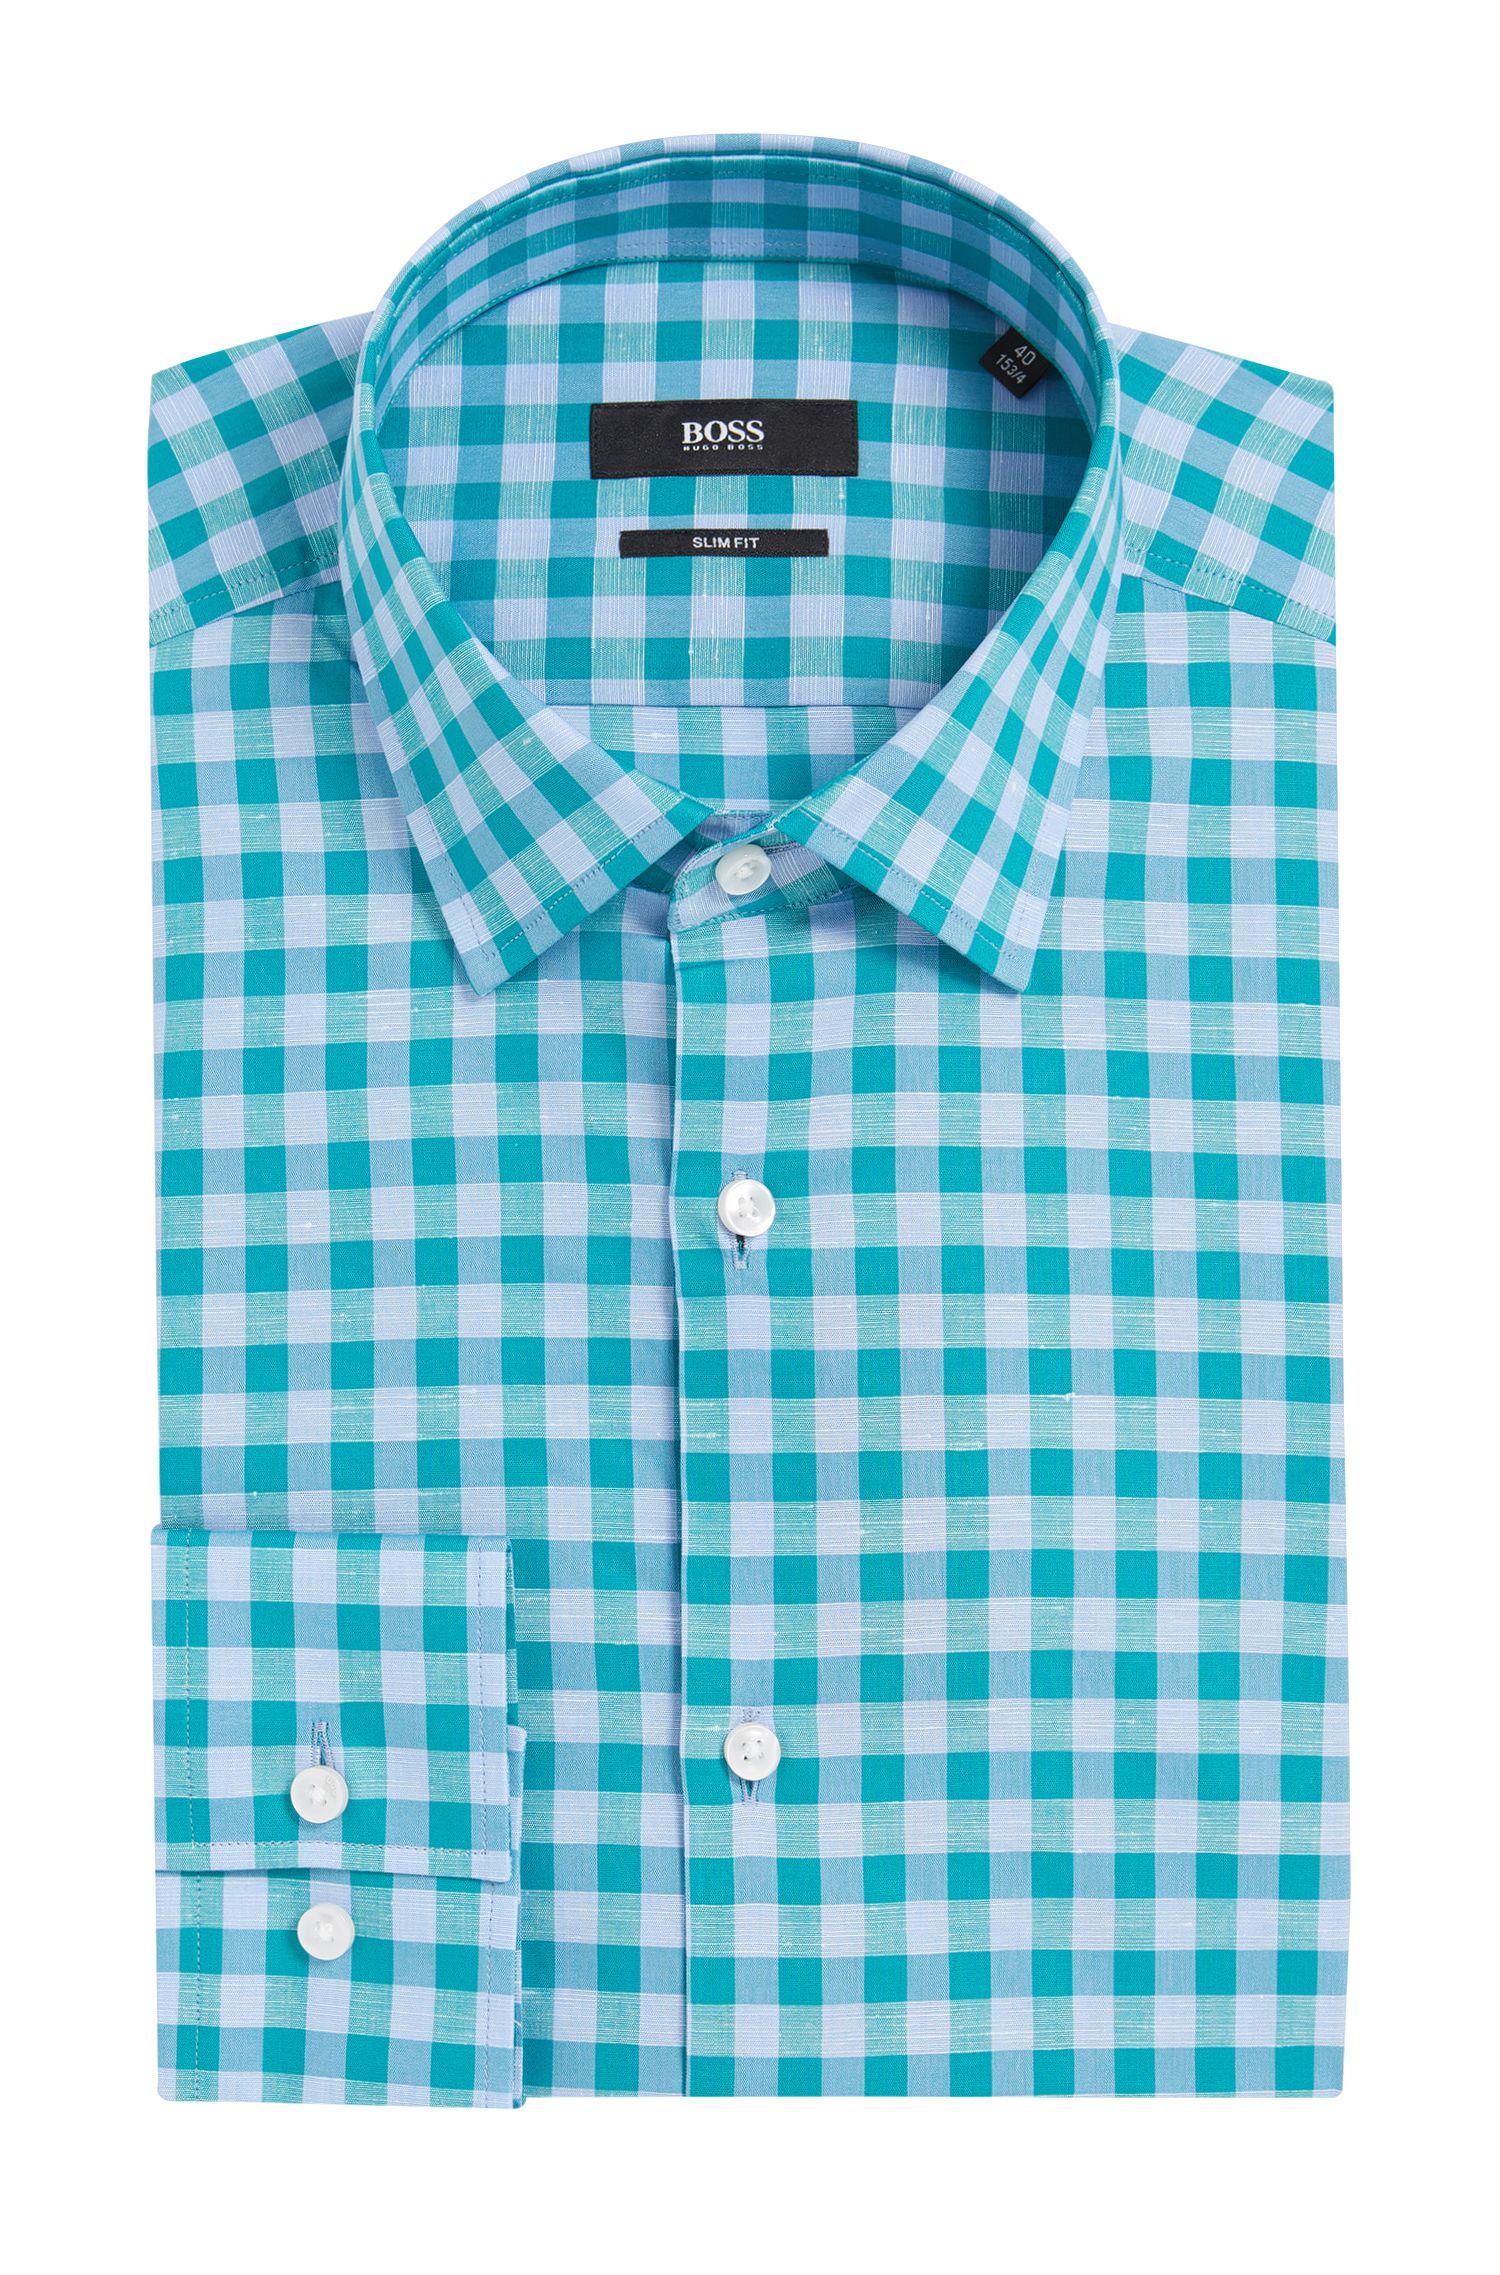 Gingham Italian Cotton-Linen Dress Shirt, Slim Fit | Jenno